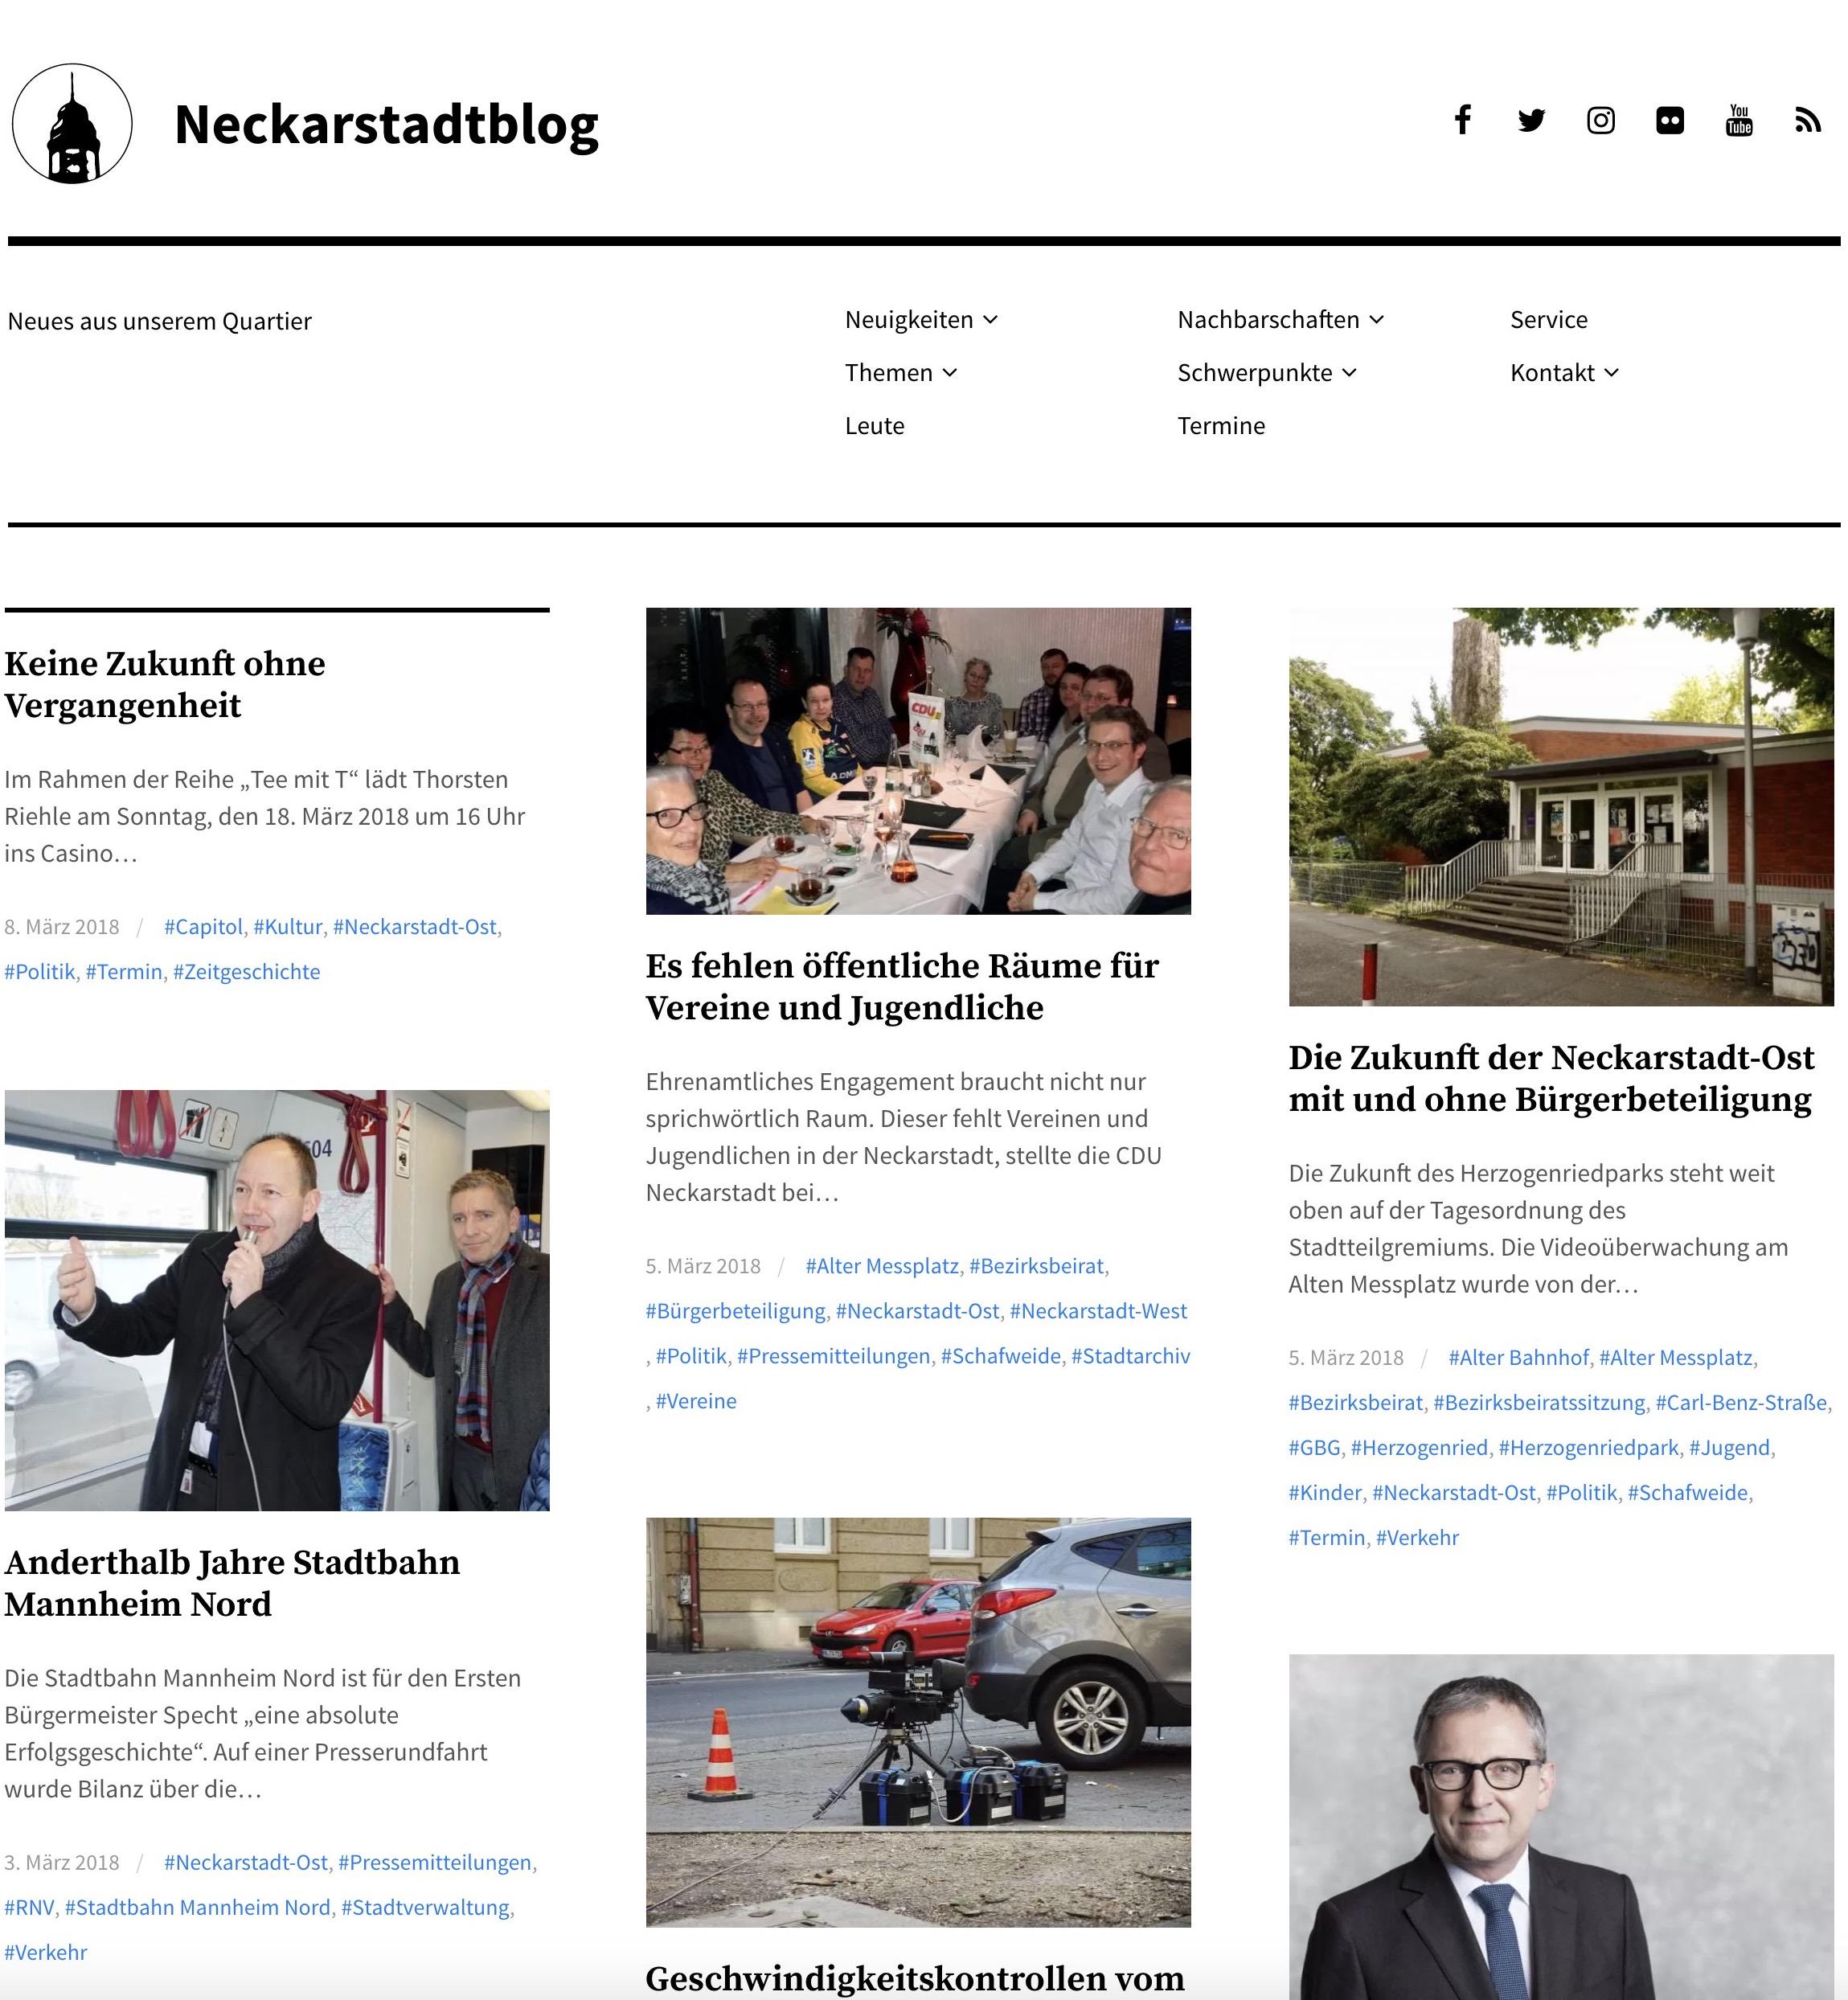 Neckarstadtblog Screenshot vom 8. März 2018